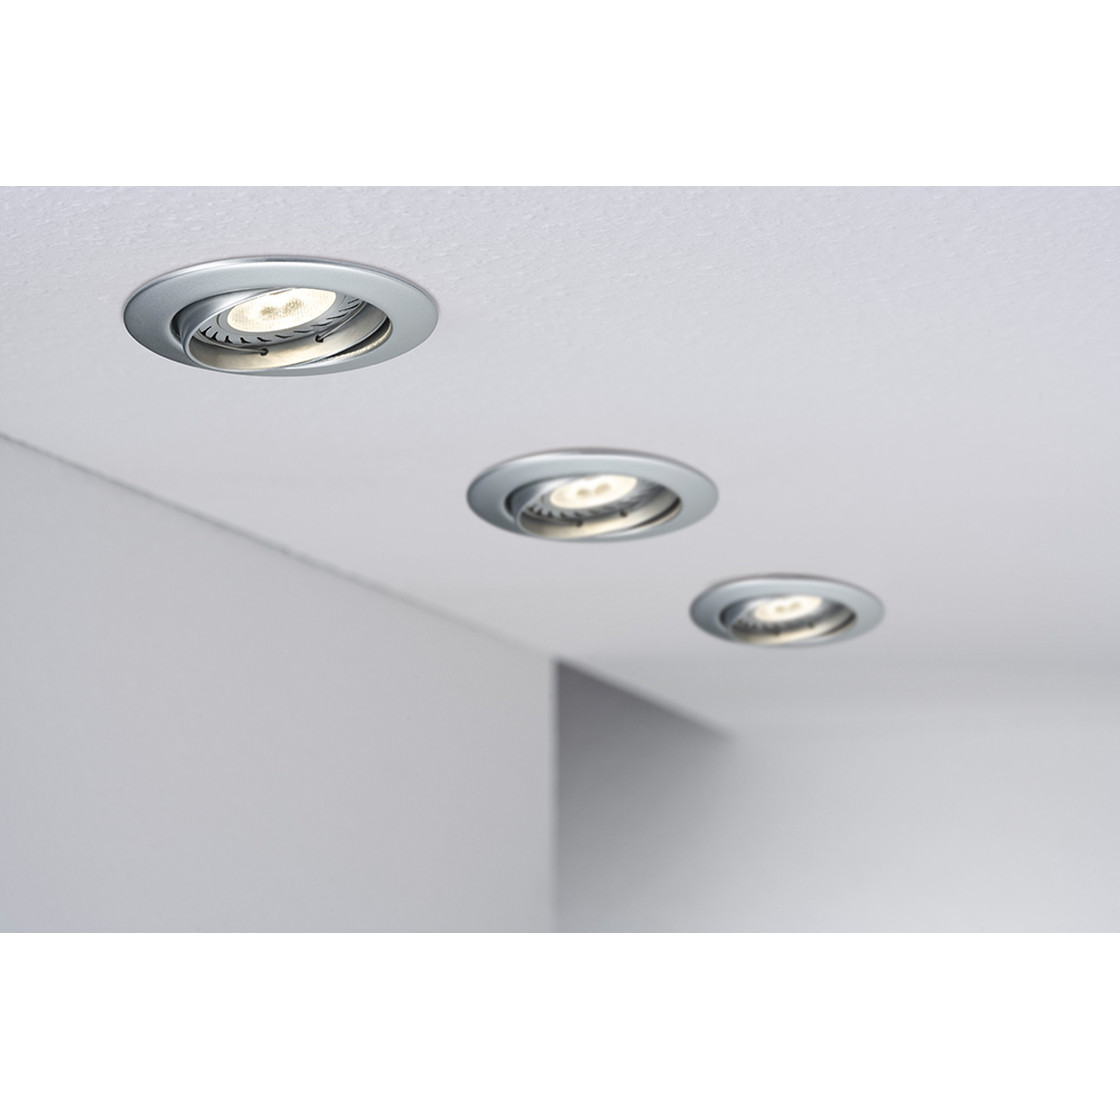 paulmann power led reflektor 1w gu10 tageslicht 38grad ausstra. Black Bedroom Furniture Sets. Home Design Ideas